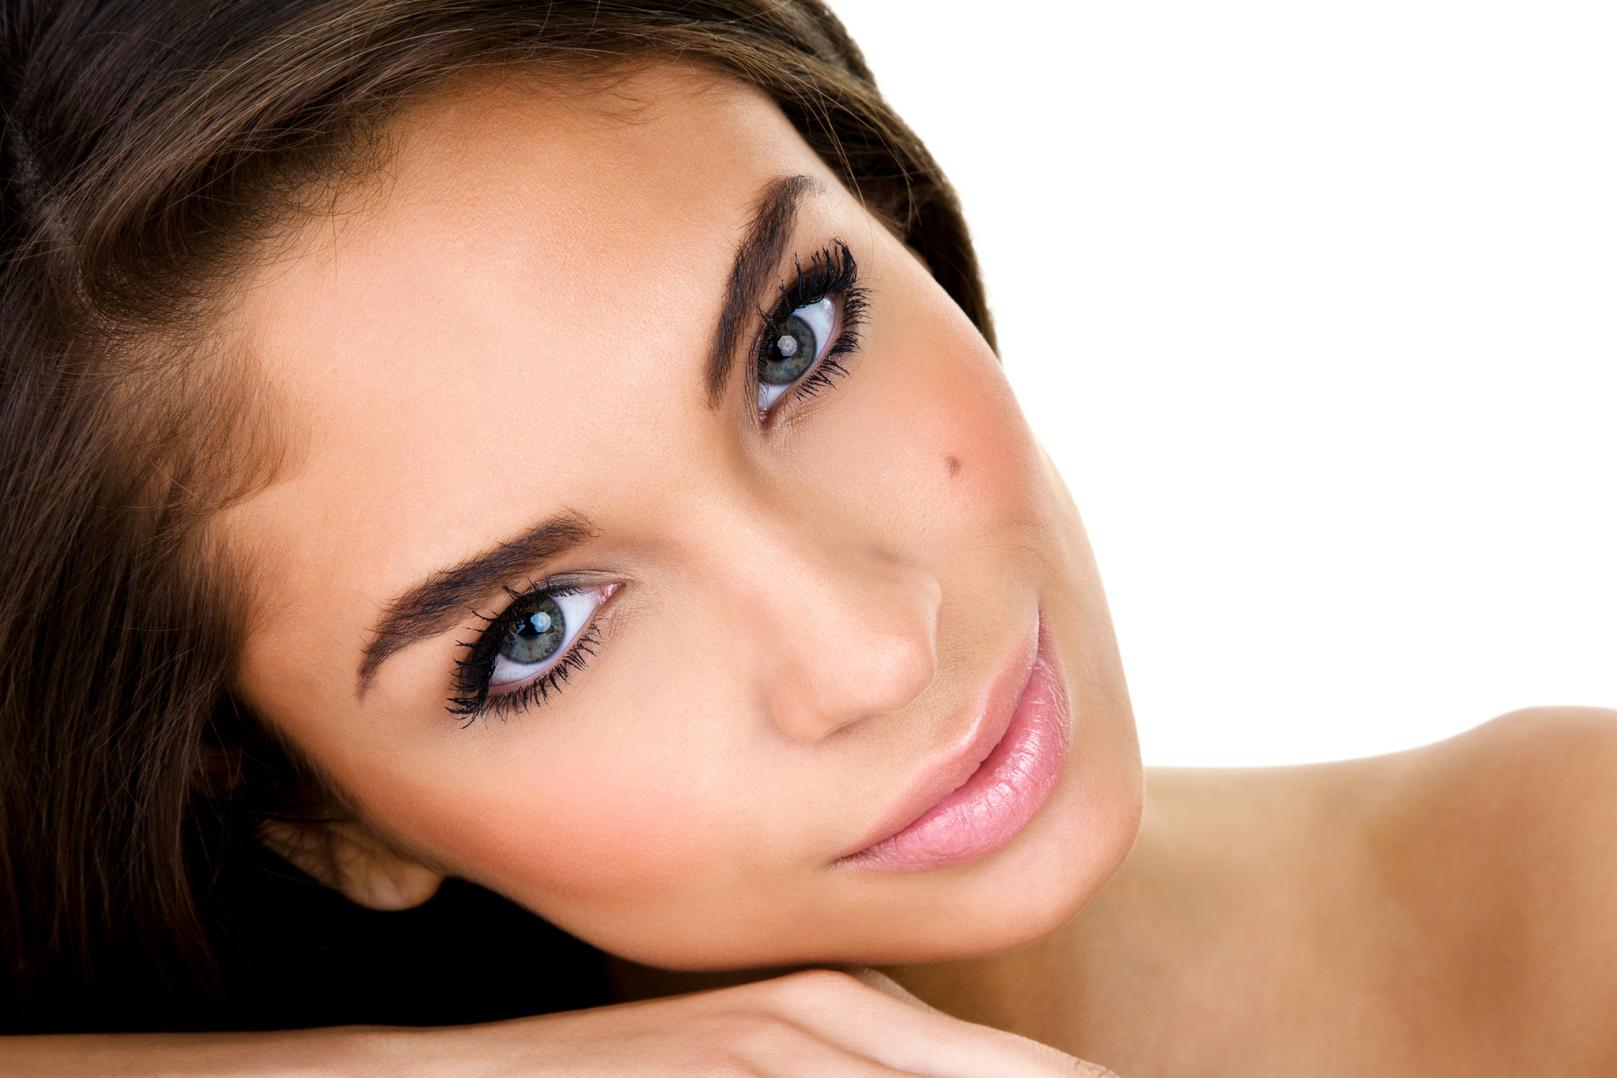 Darkening a Beauty Mark With Cosmetics | LoveToKnow